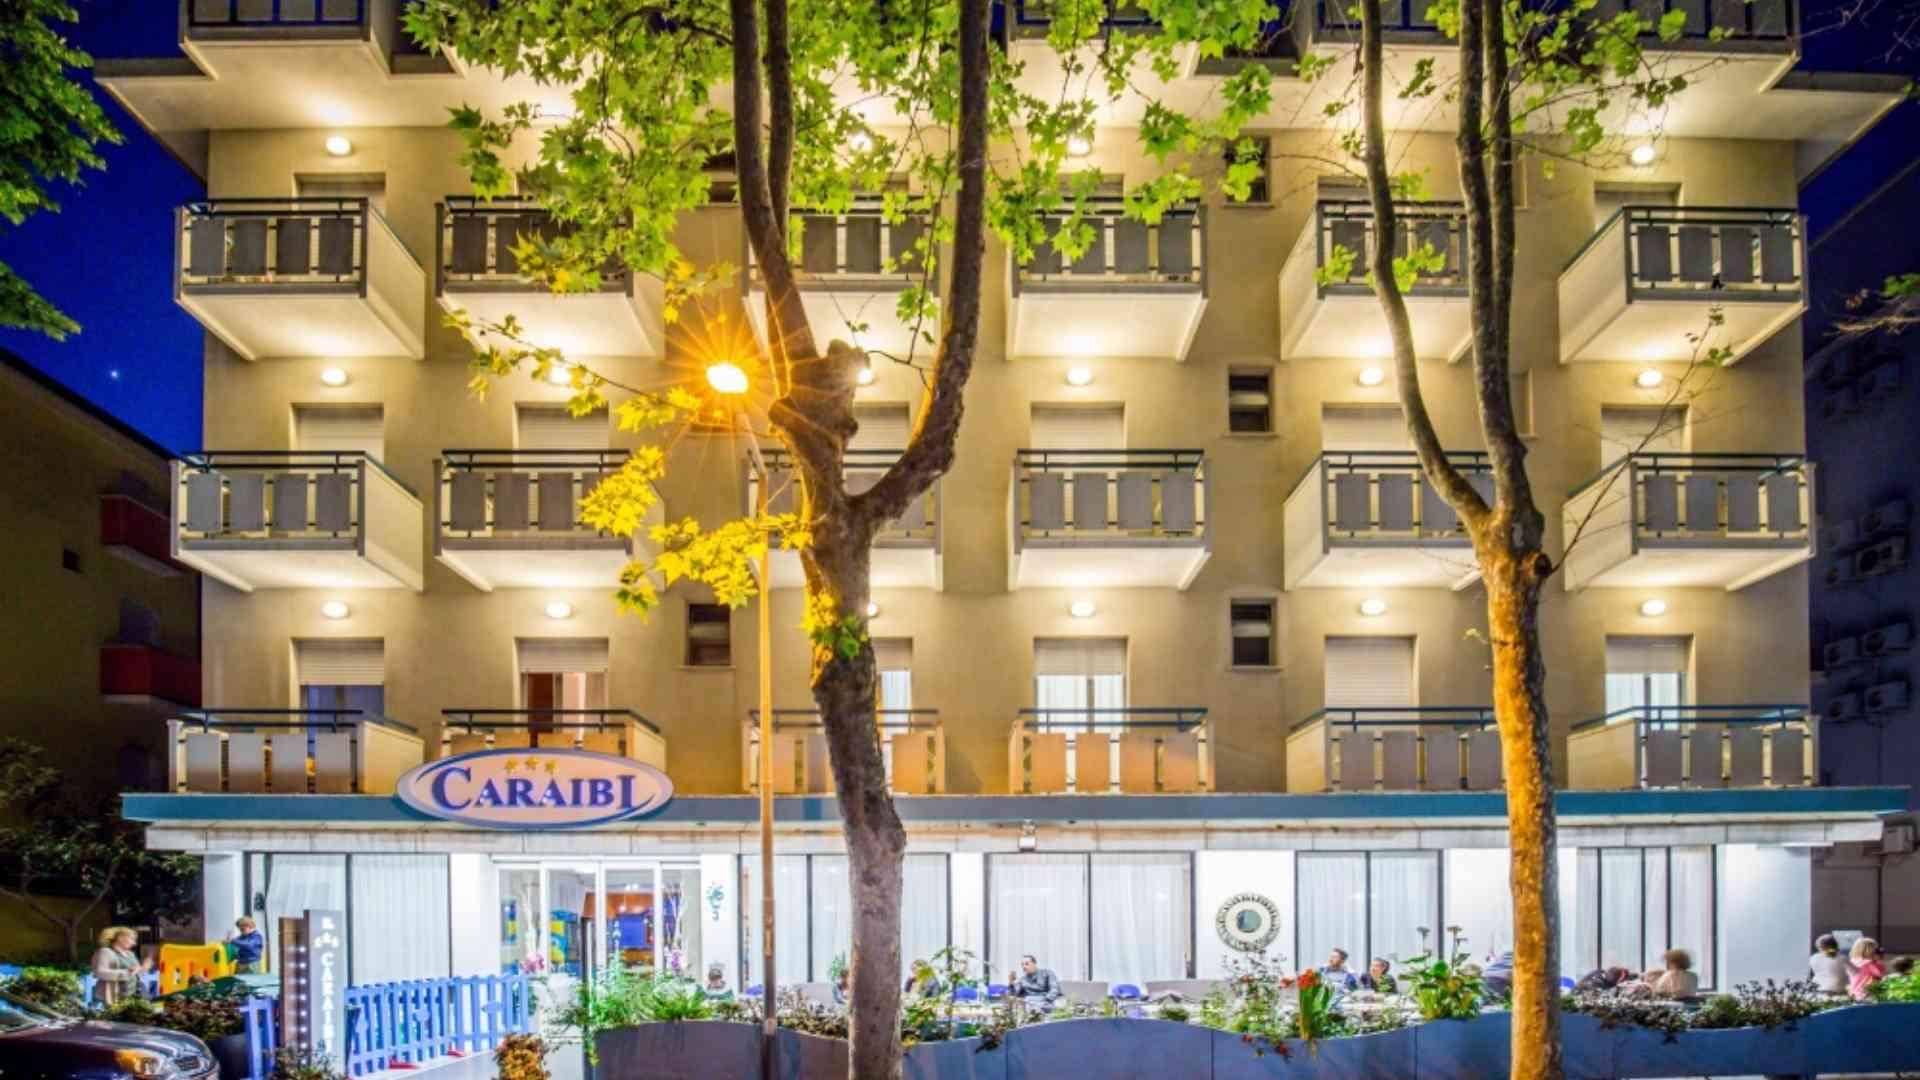 EVIDENZA_Esterno_Hotel Caraibi